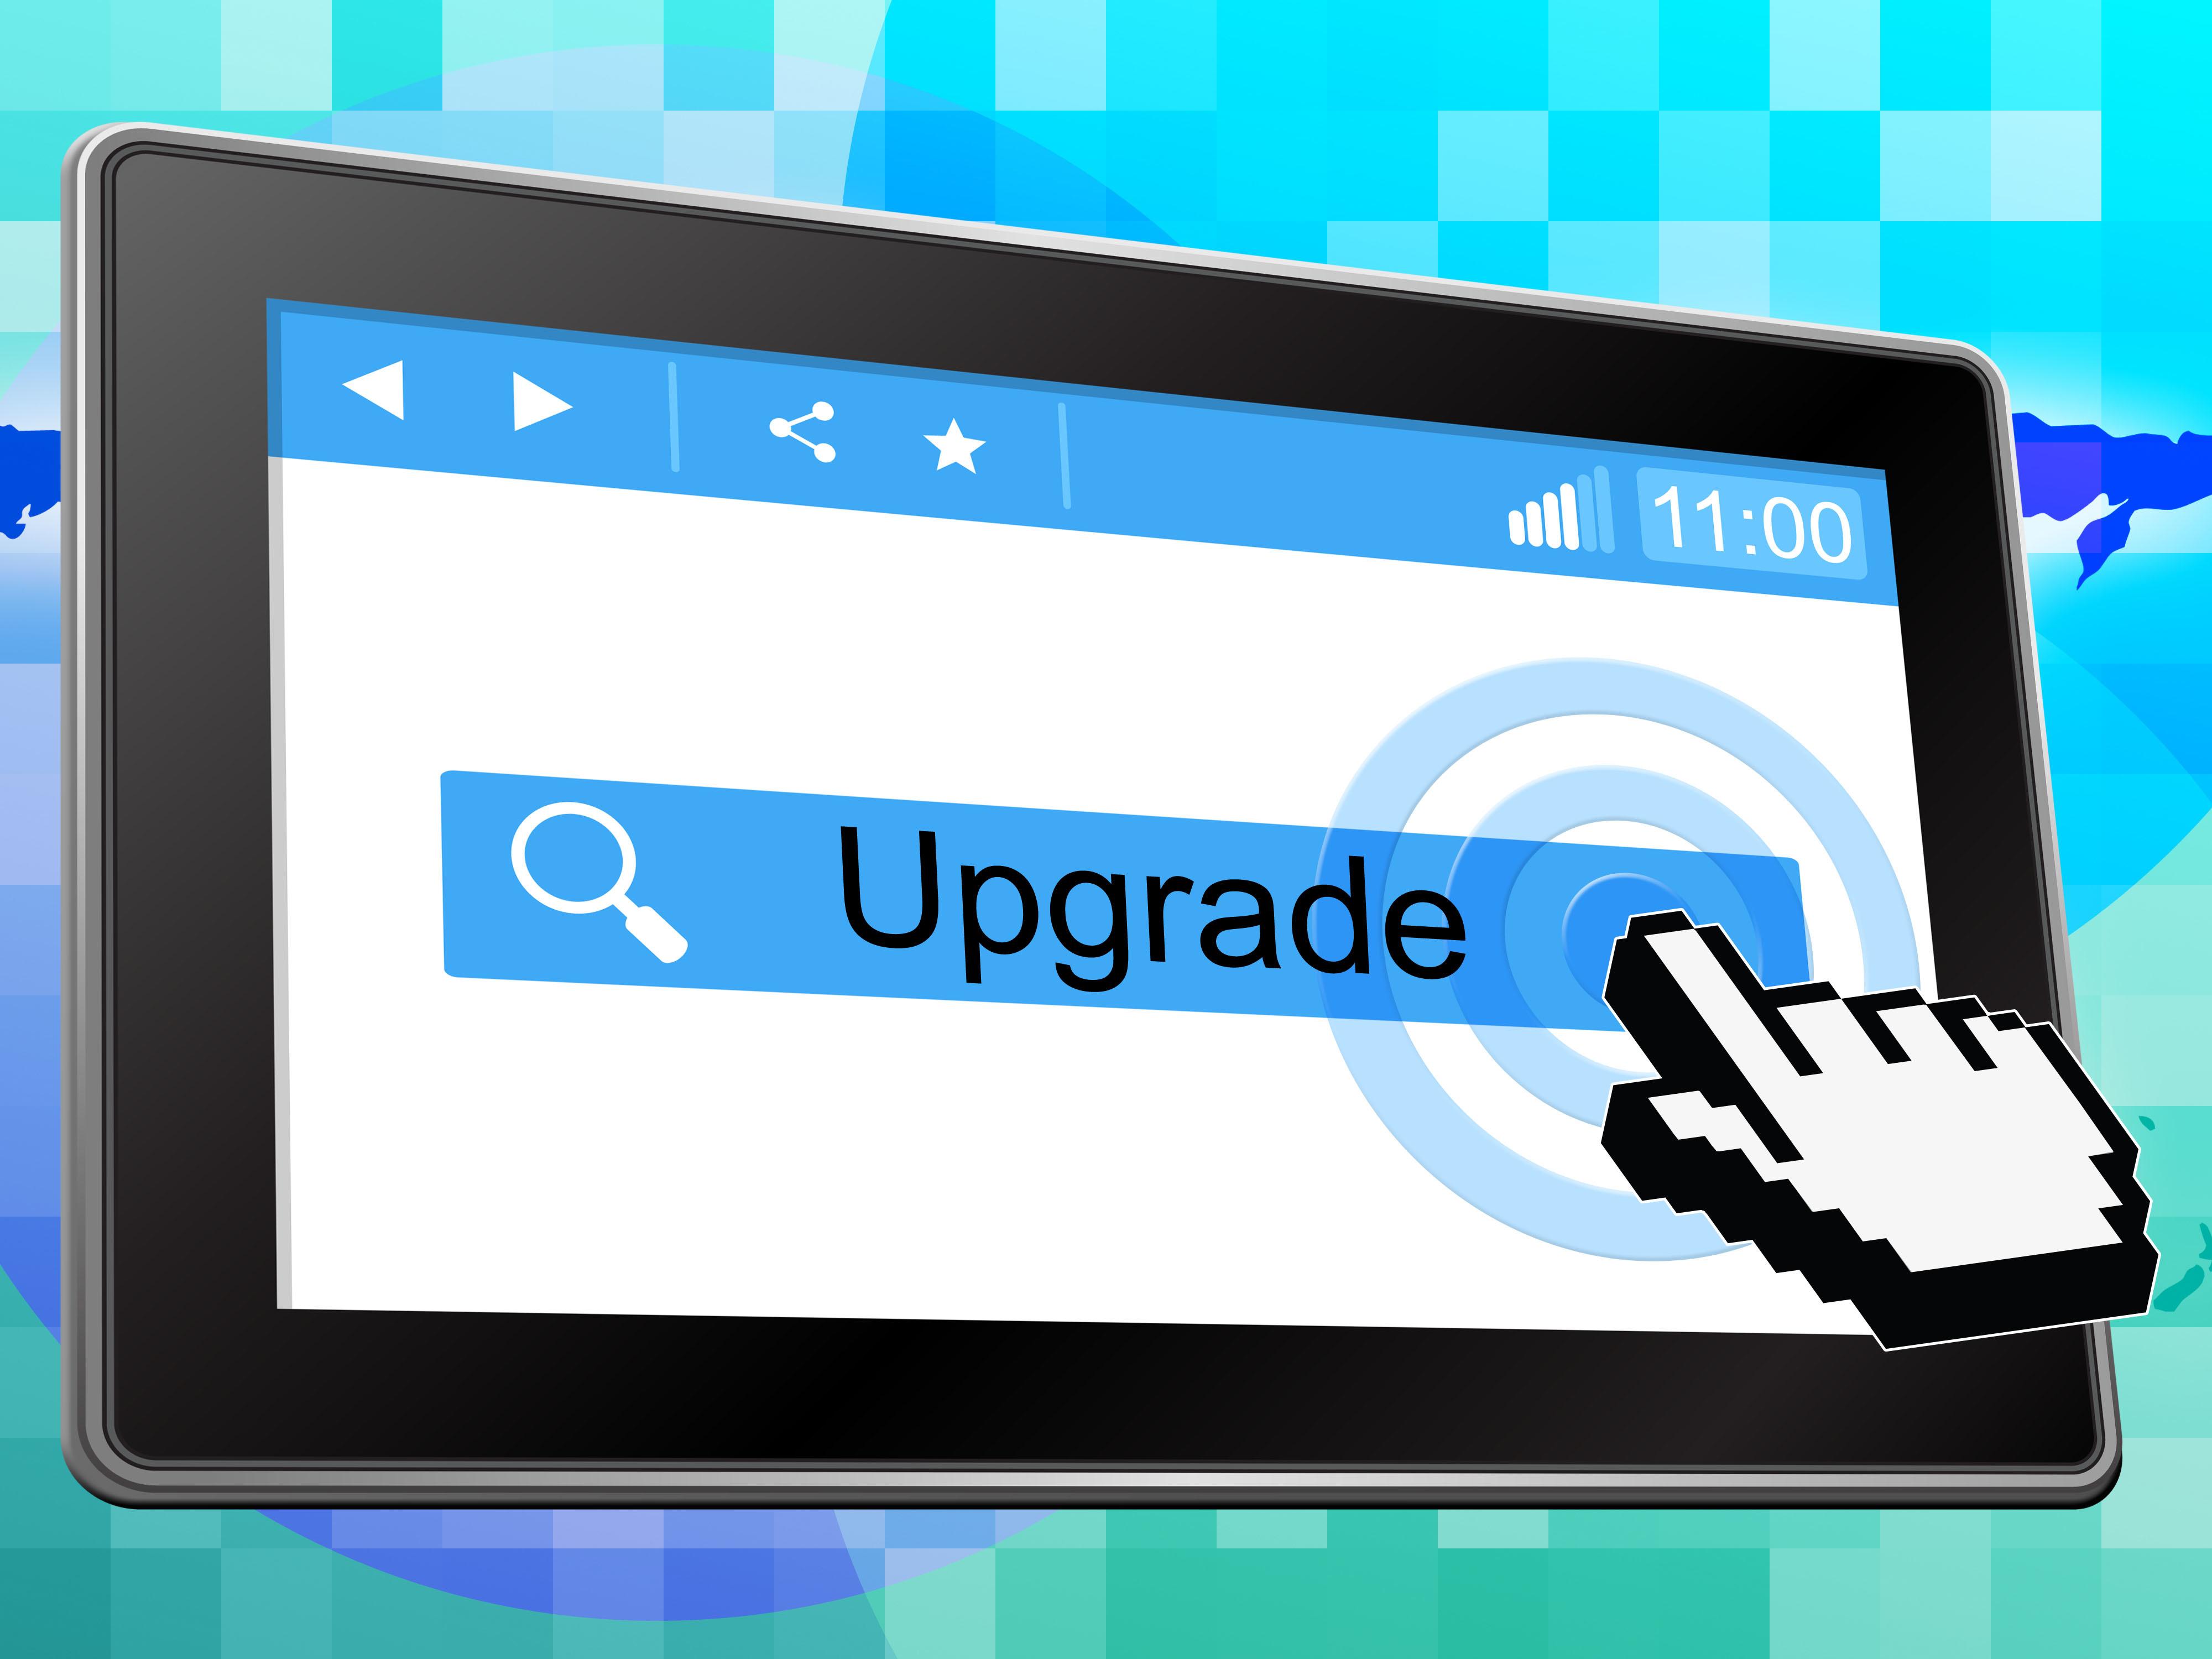 Online Upgrade Indicates World Wide Web And Refurbish